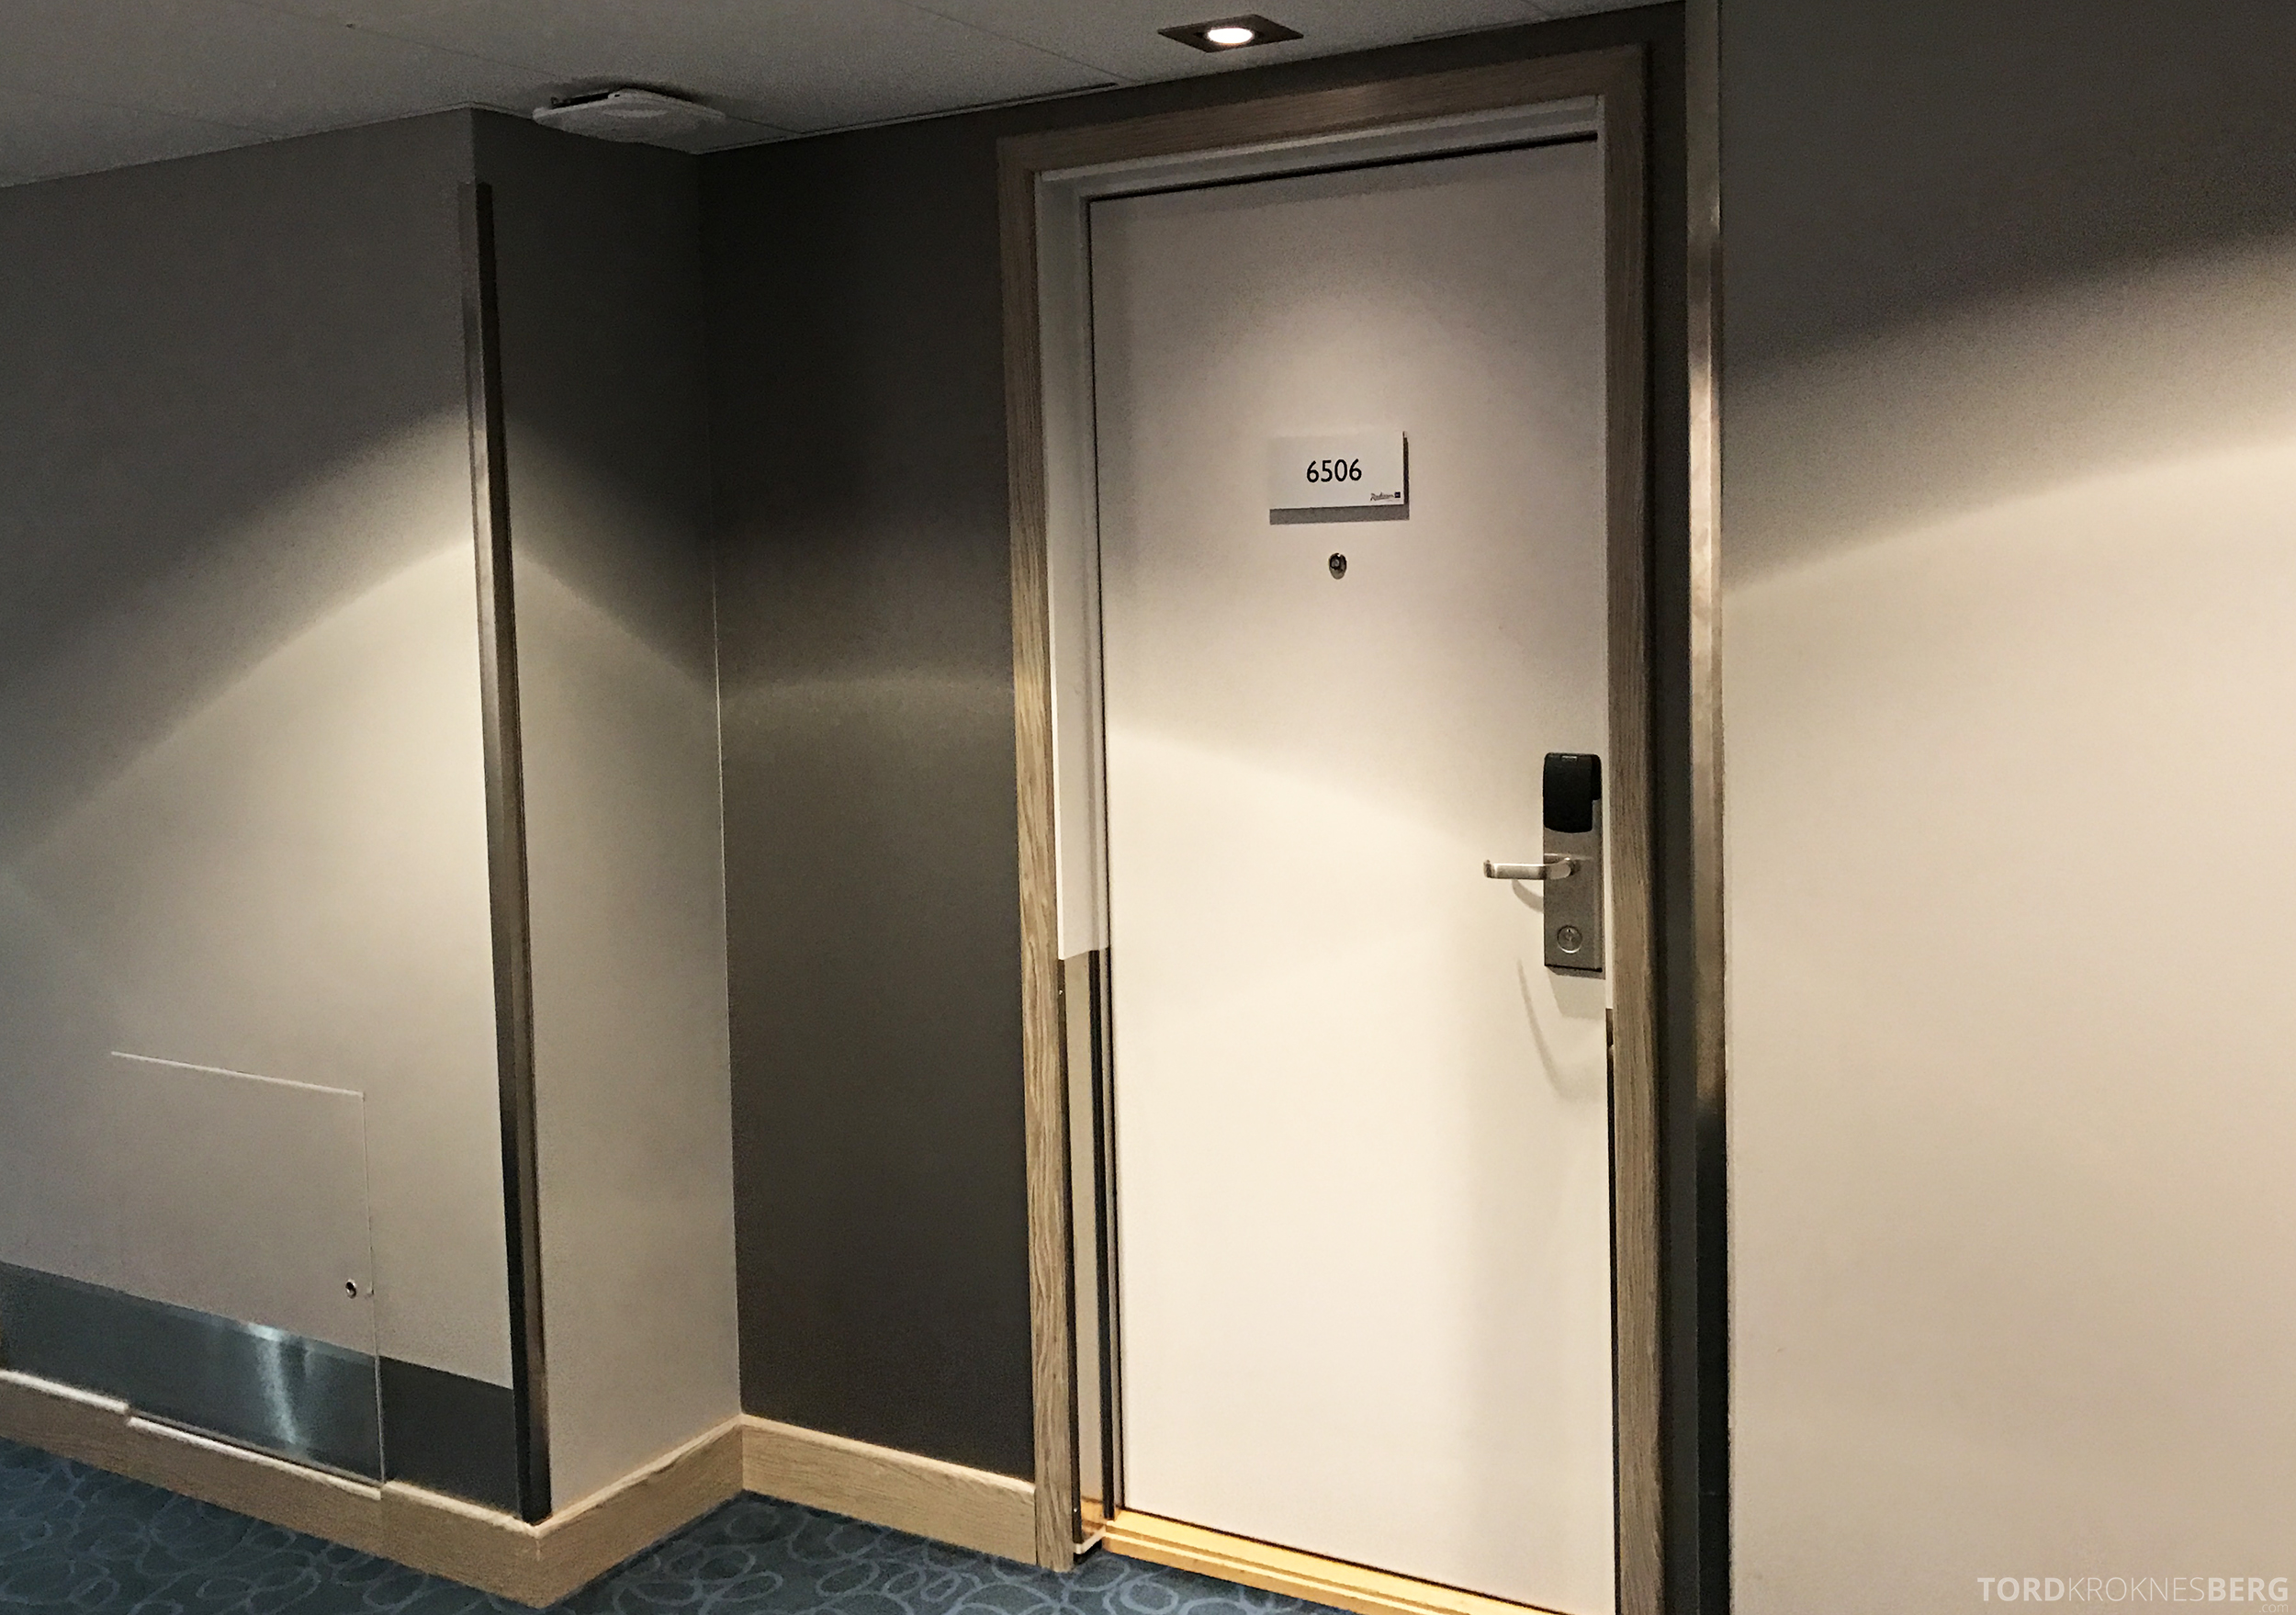 Radisson Blu Oslo Airport Hotel Suite dør